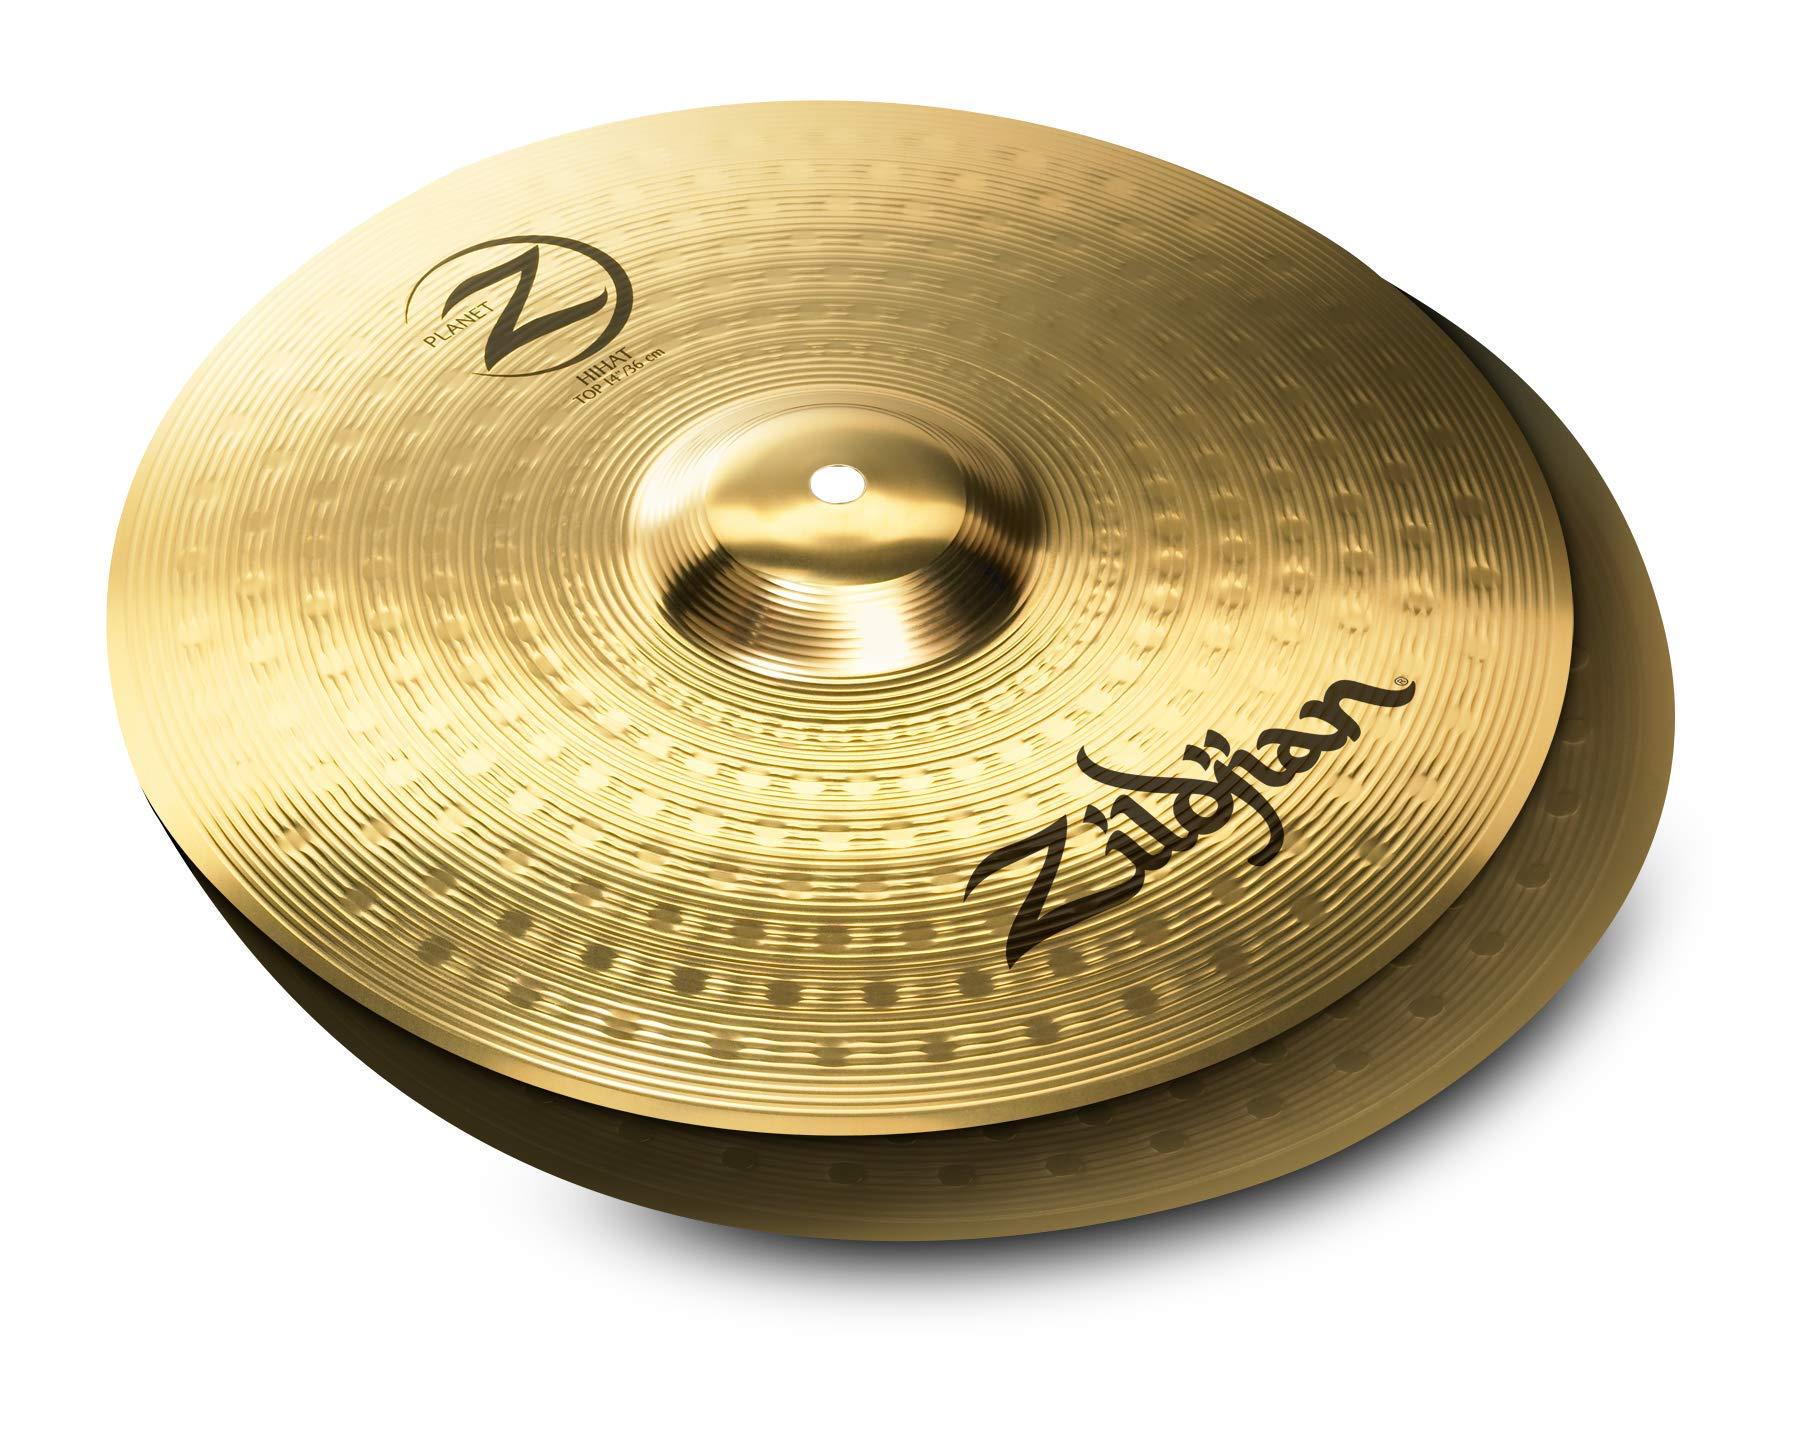 Zildjian Planet Z 4 Cymbal Set (14'' pr, 16'', 20'') by Avedis Zildjian Company (Image #2)